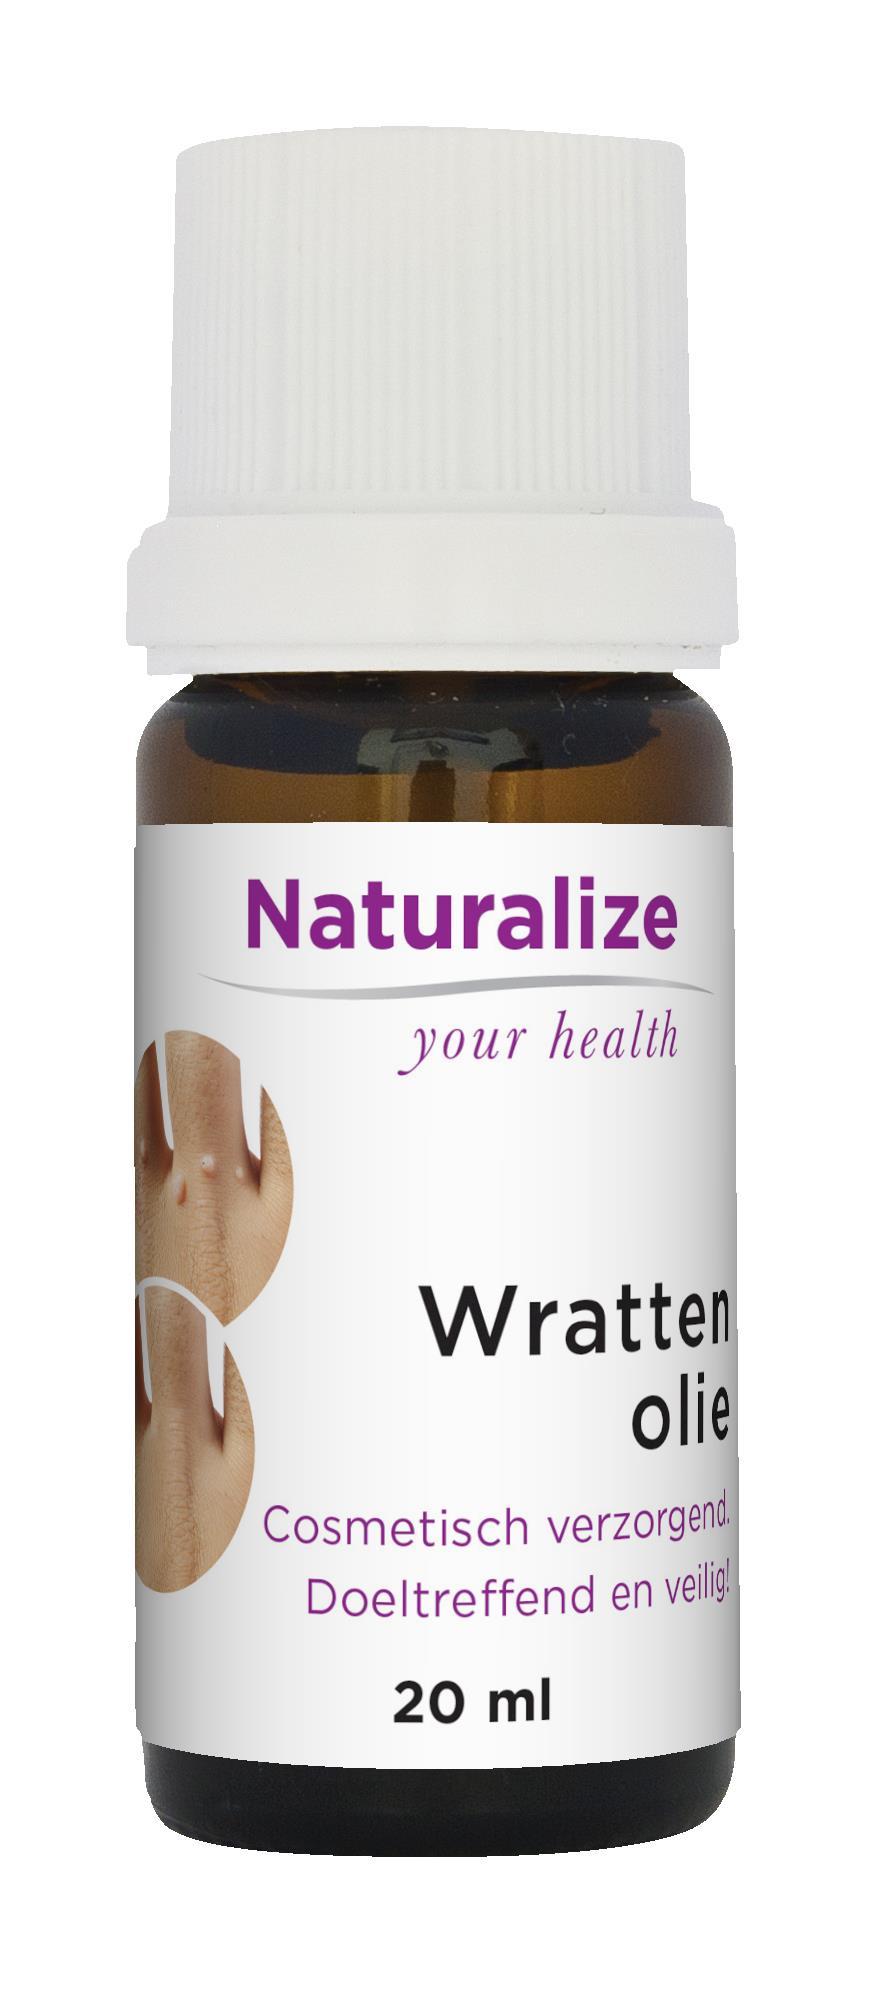 Naturalize Wrattenolie (20 milliliter)